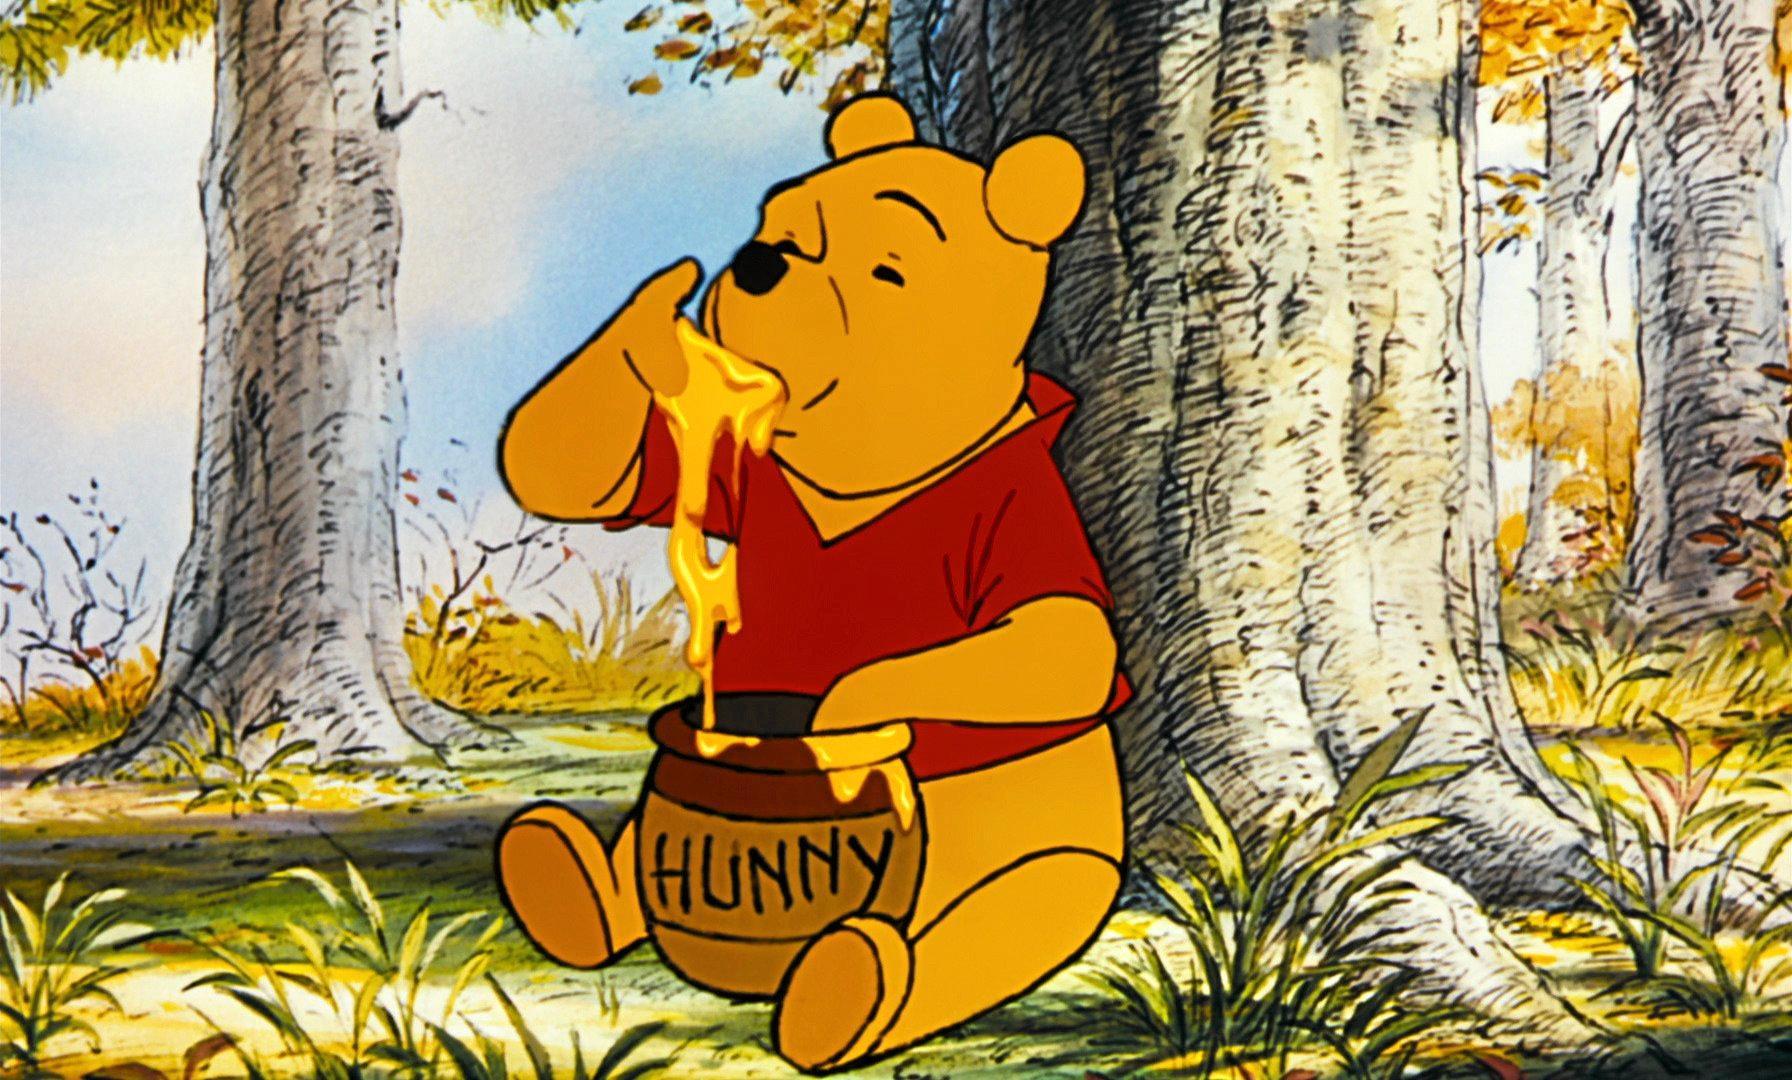 POOH BEAR: A still of Disney's Winnie the Pooh.